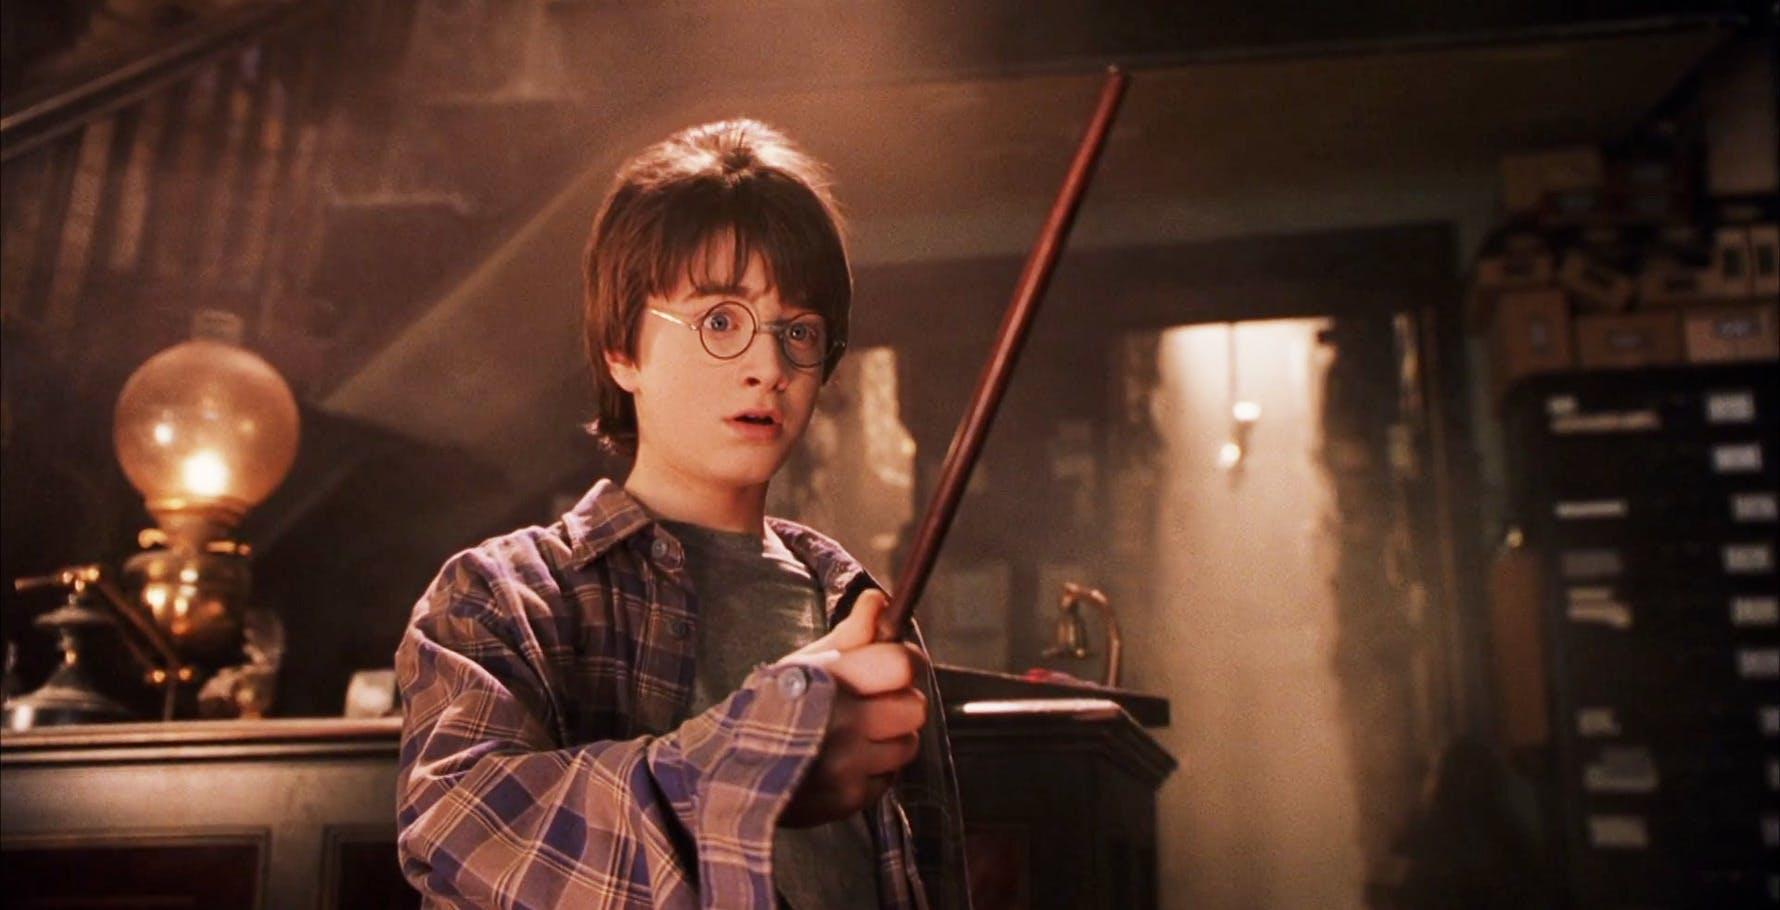 Harry Potter receiving wand